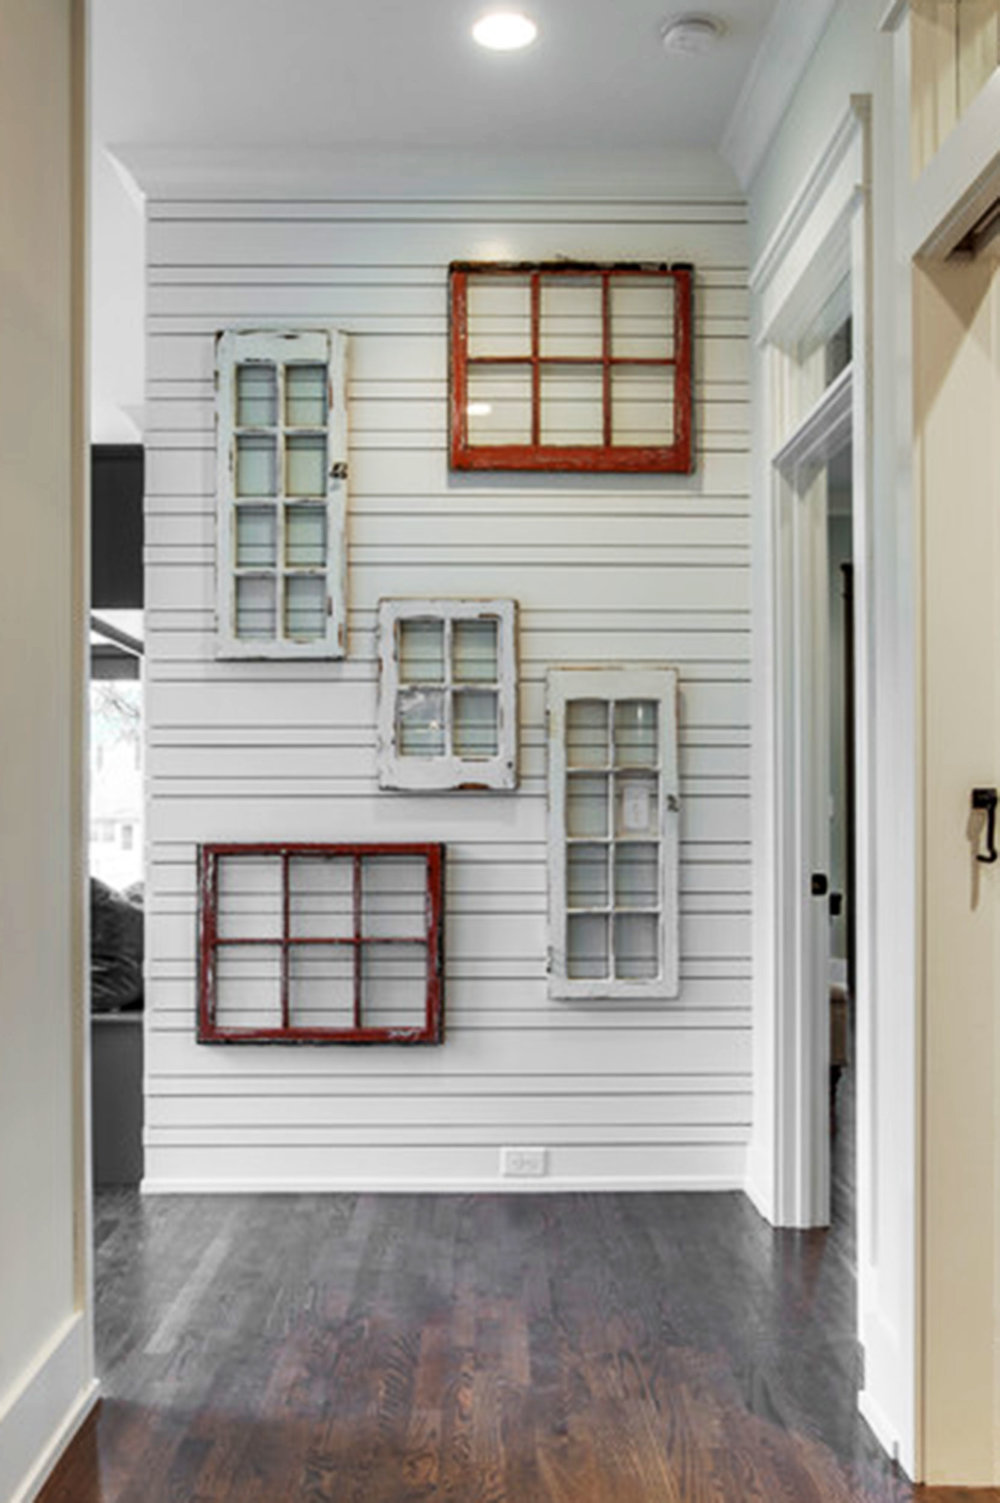 historic_windows.jpg